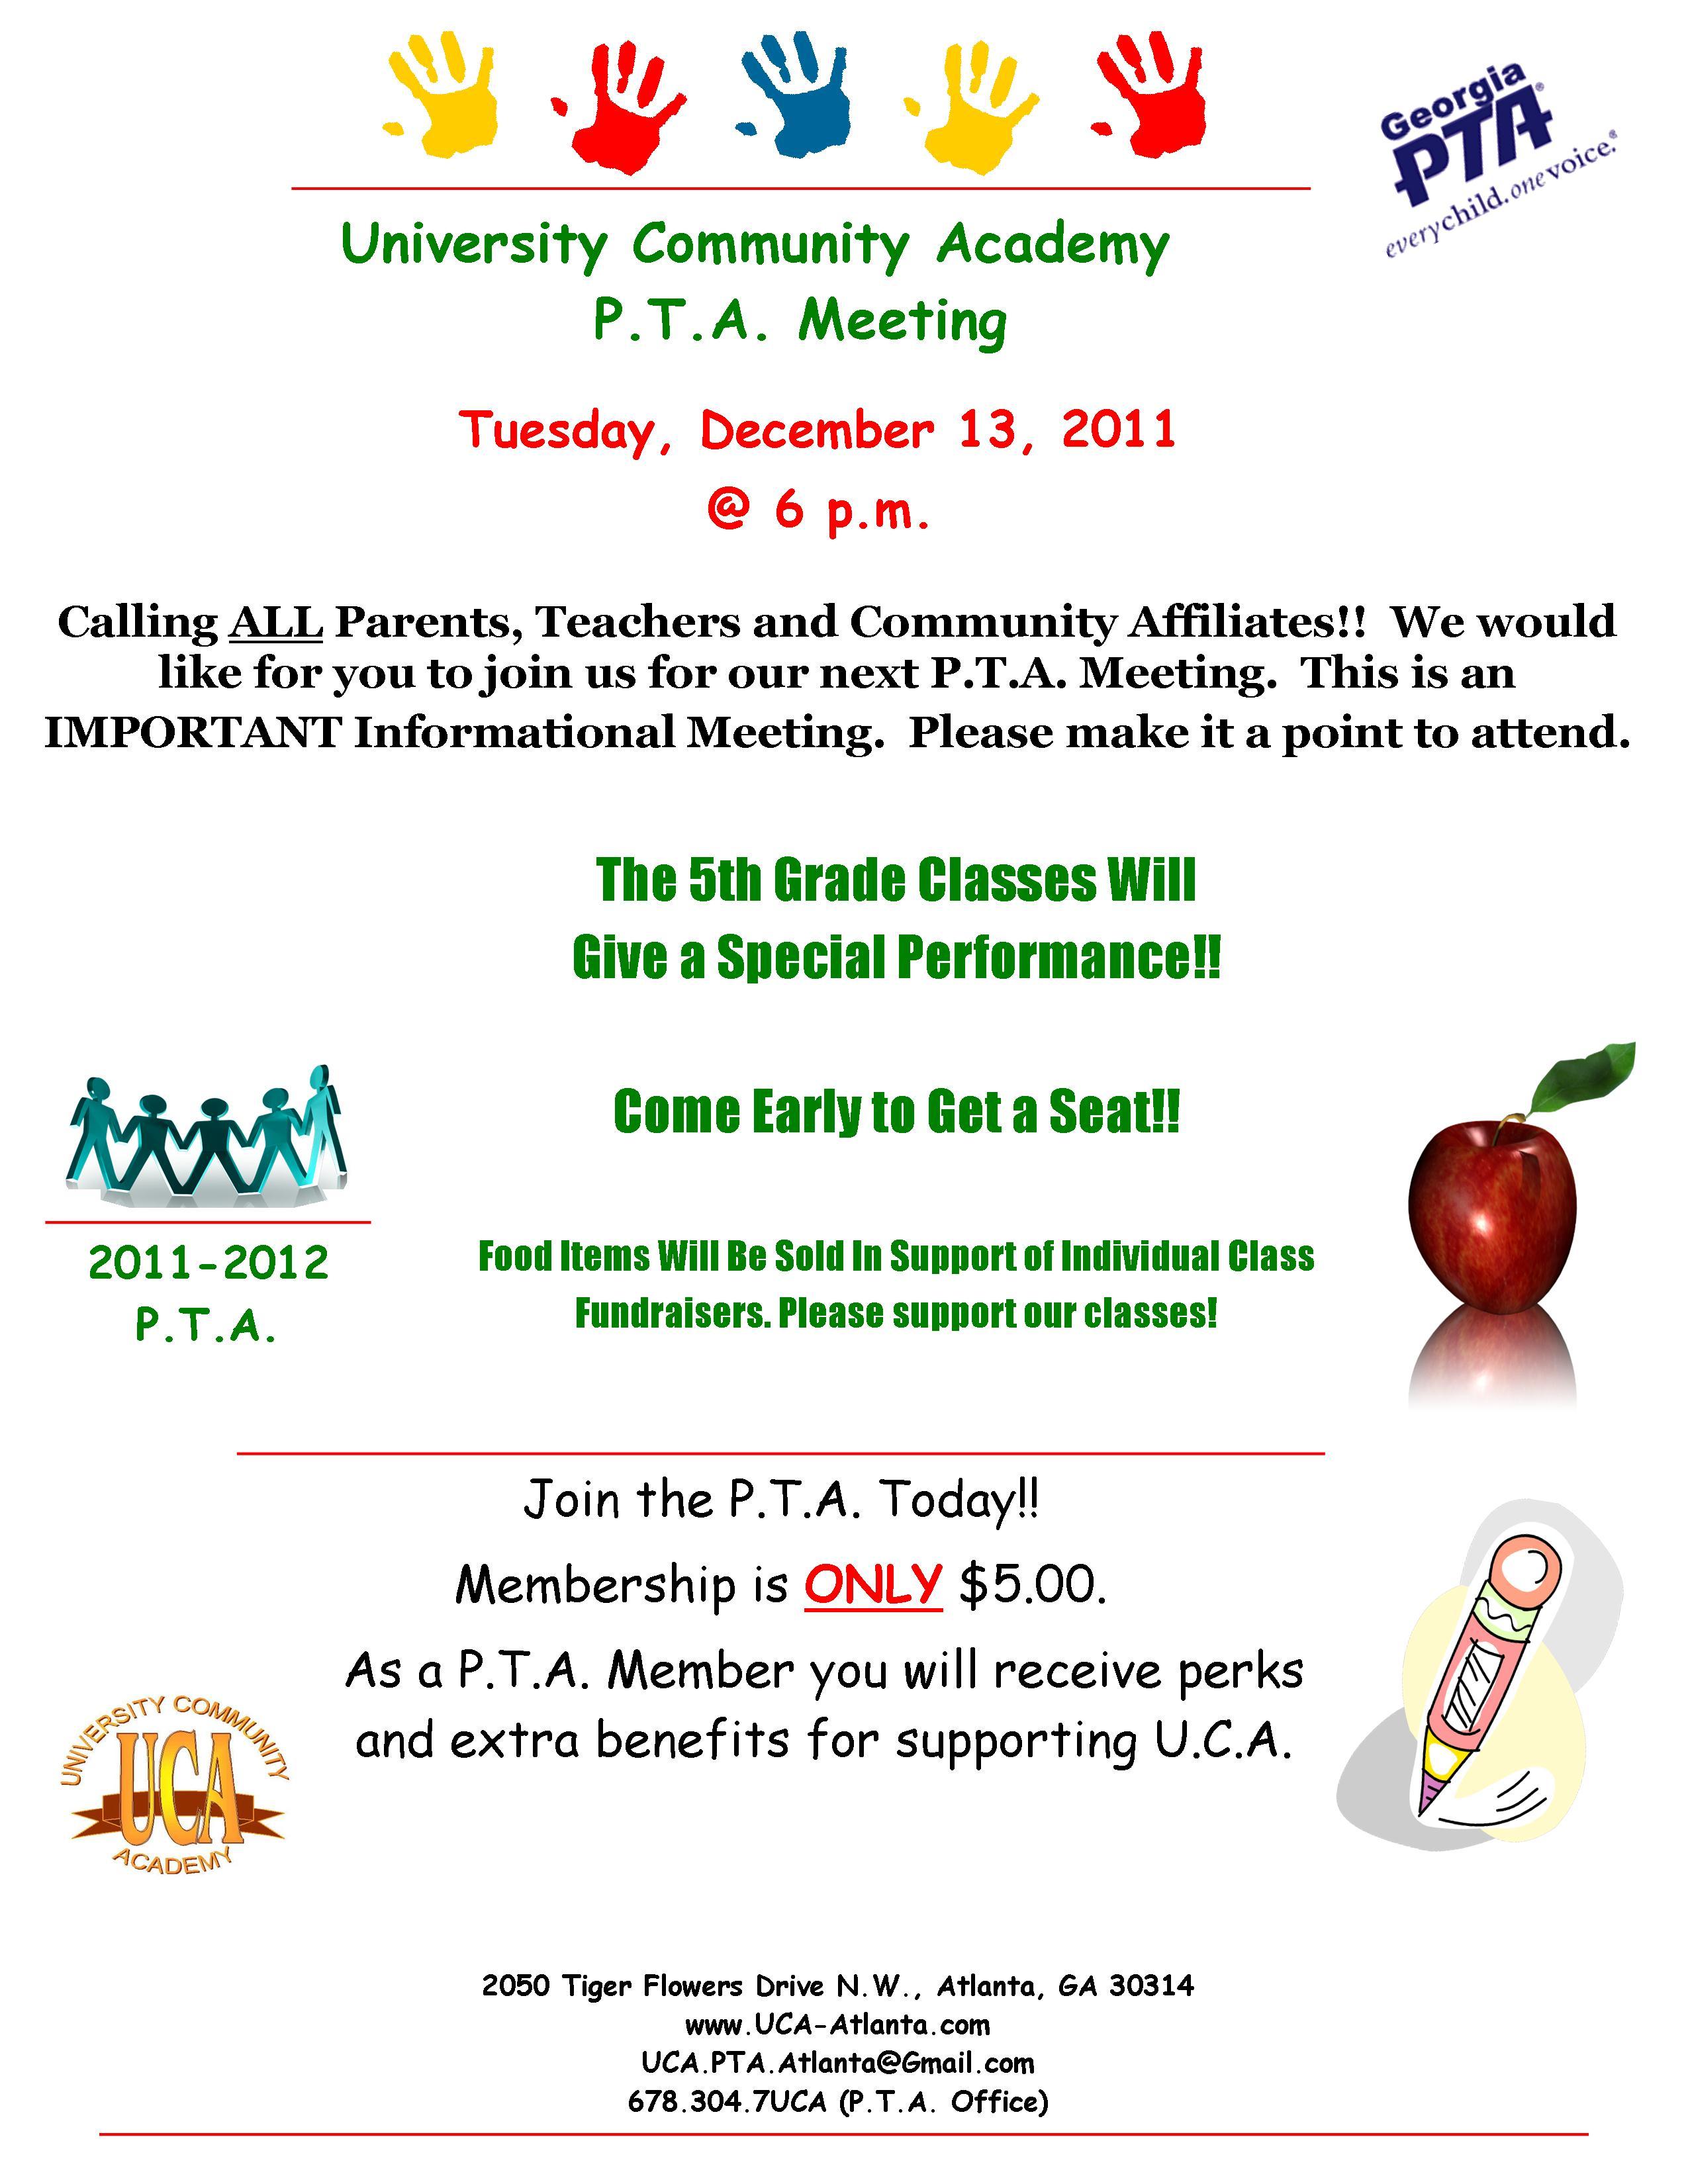 University Community Academy December P.T.A. Meeting ...